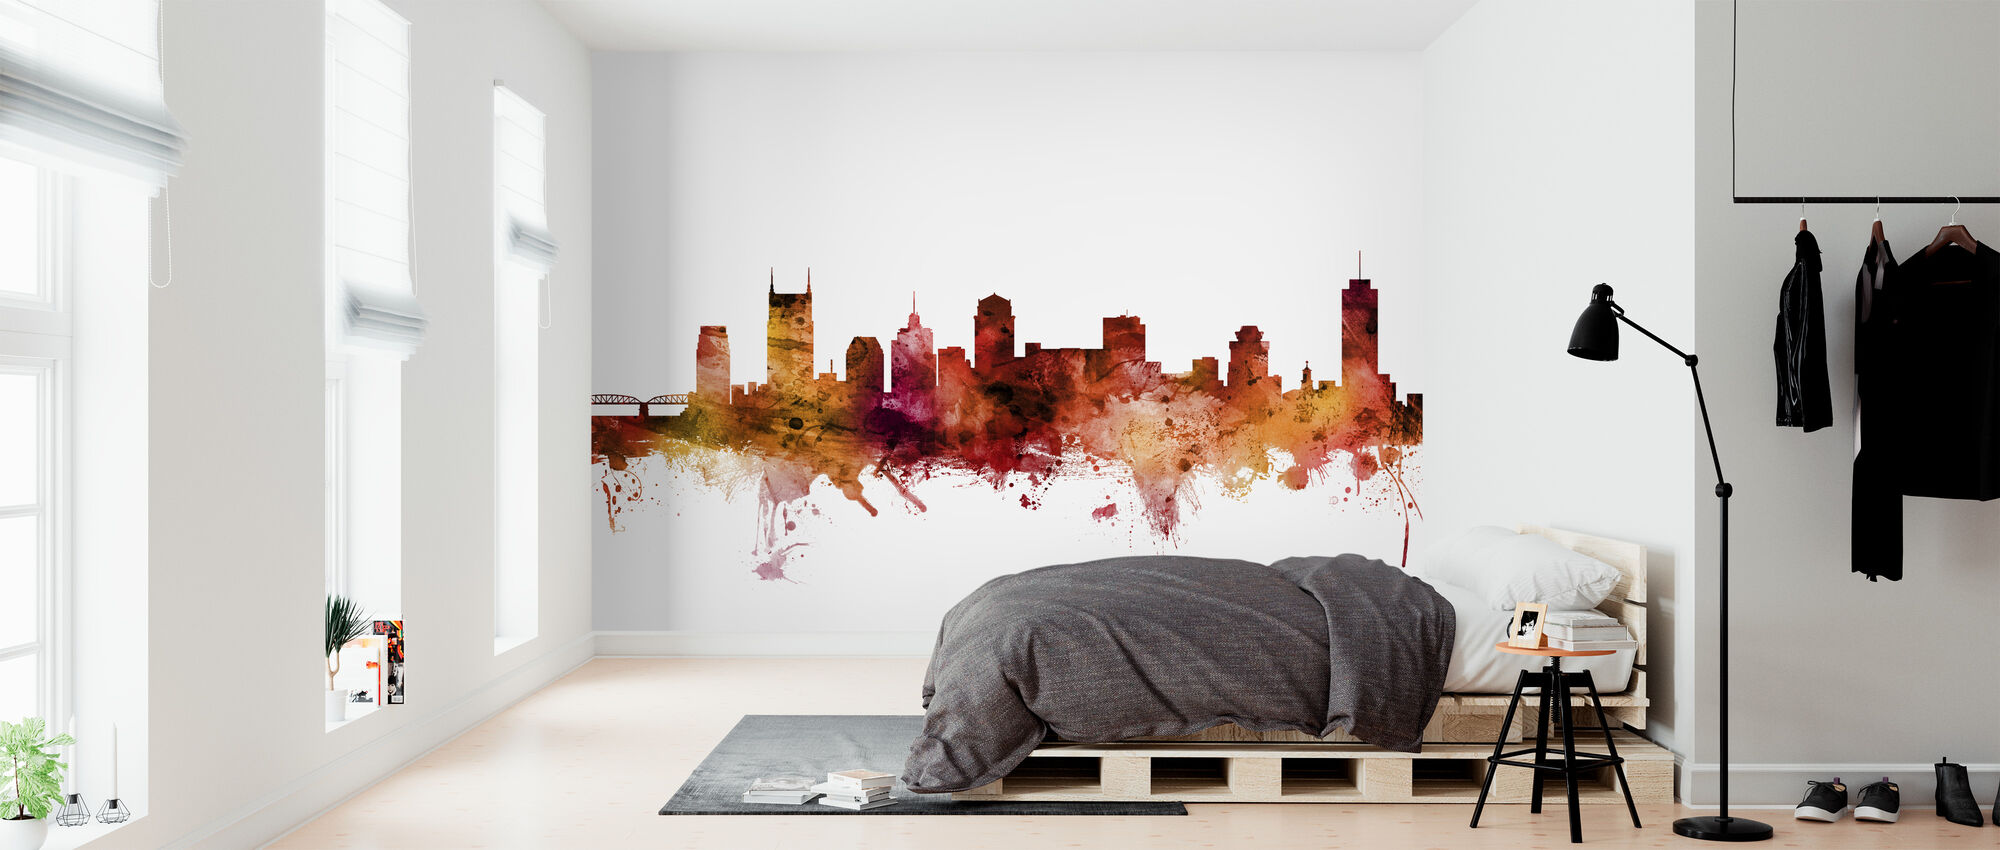 Nashville Tennessee Skyline - Wallpaper - Bedroom